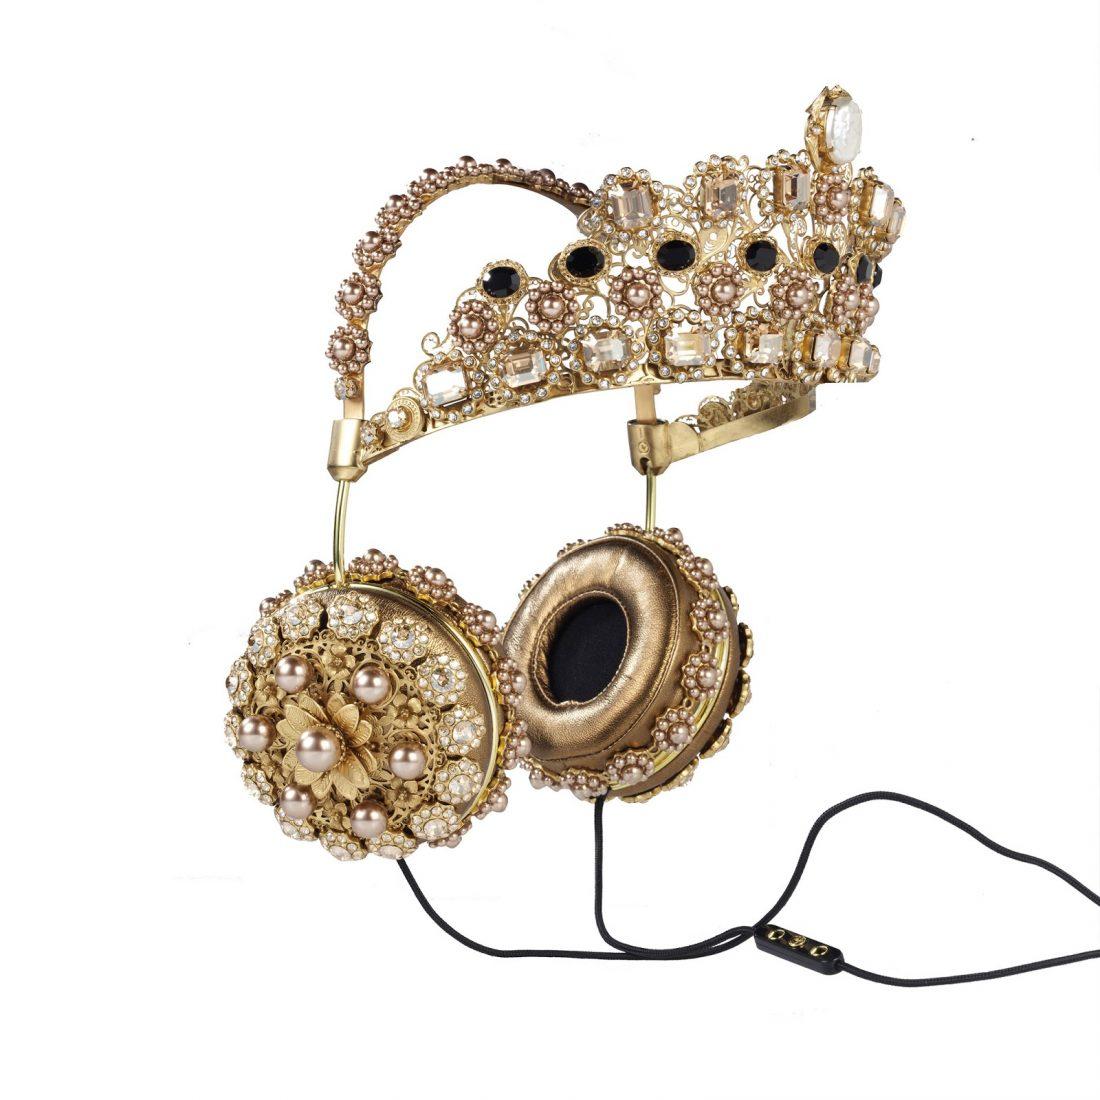 "Dolce & Gabbana's ""Napa Leather Rhinestone Headphones With Crown"""